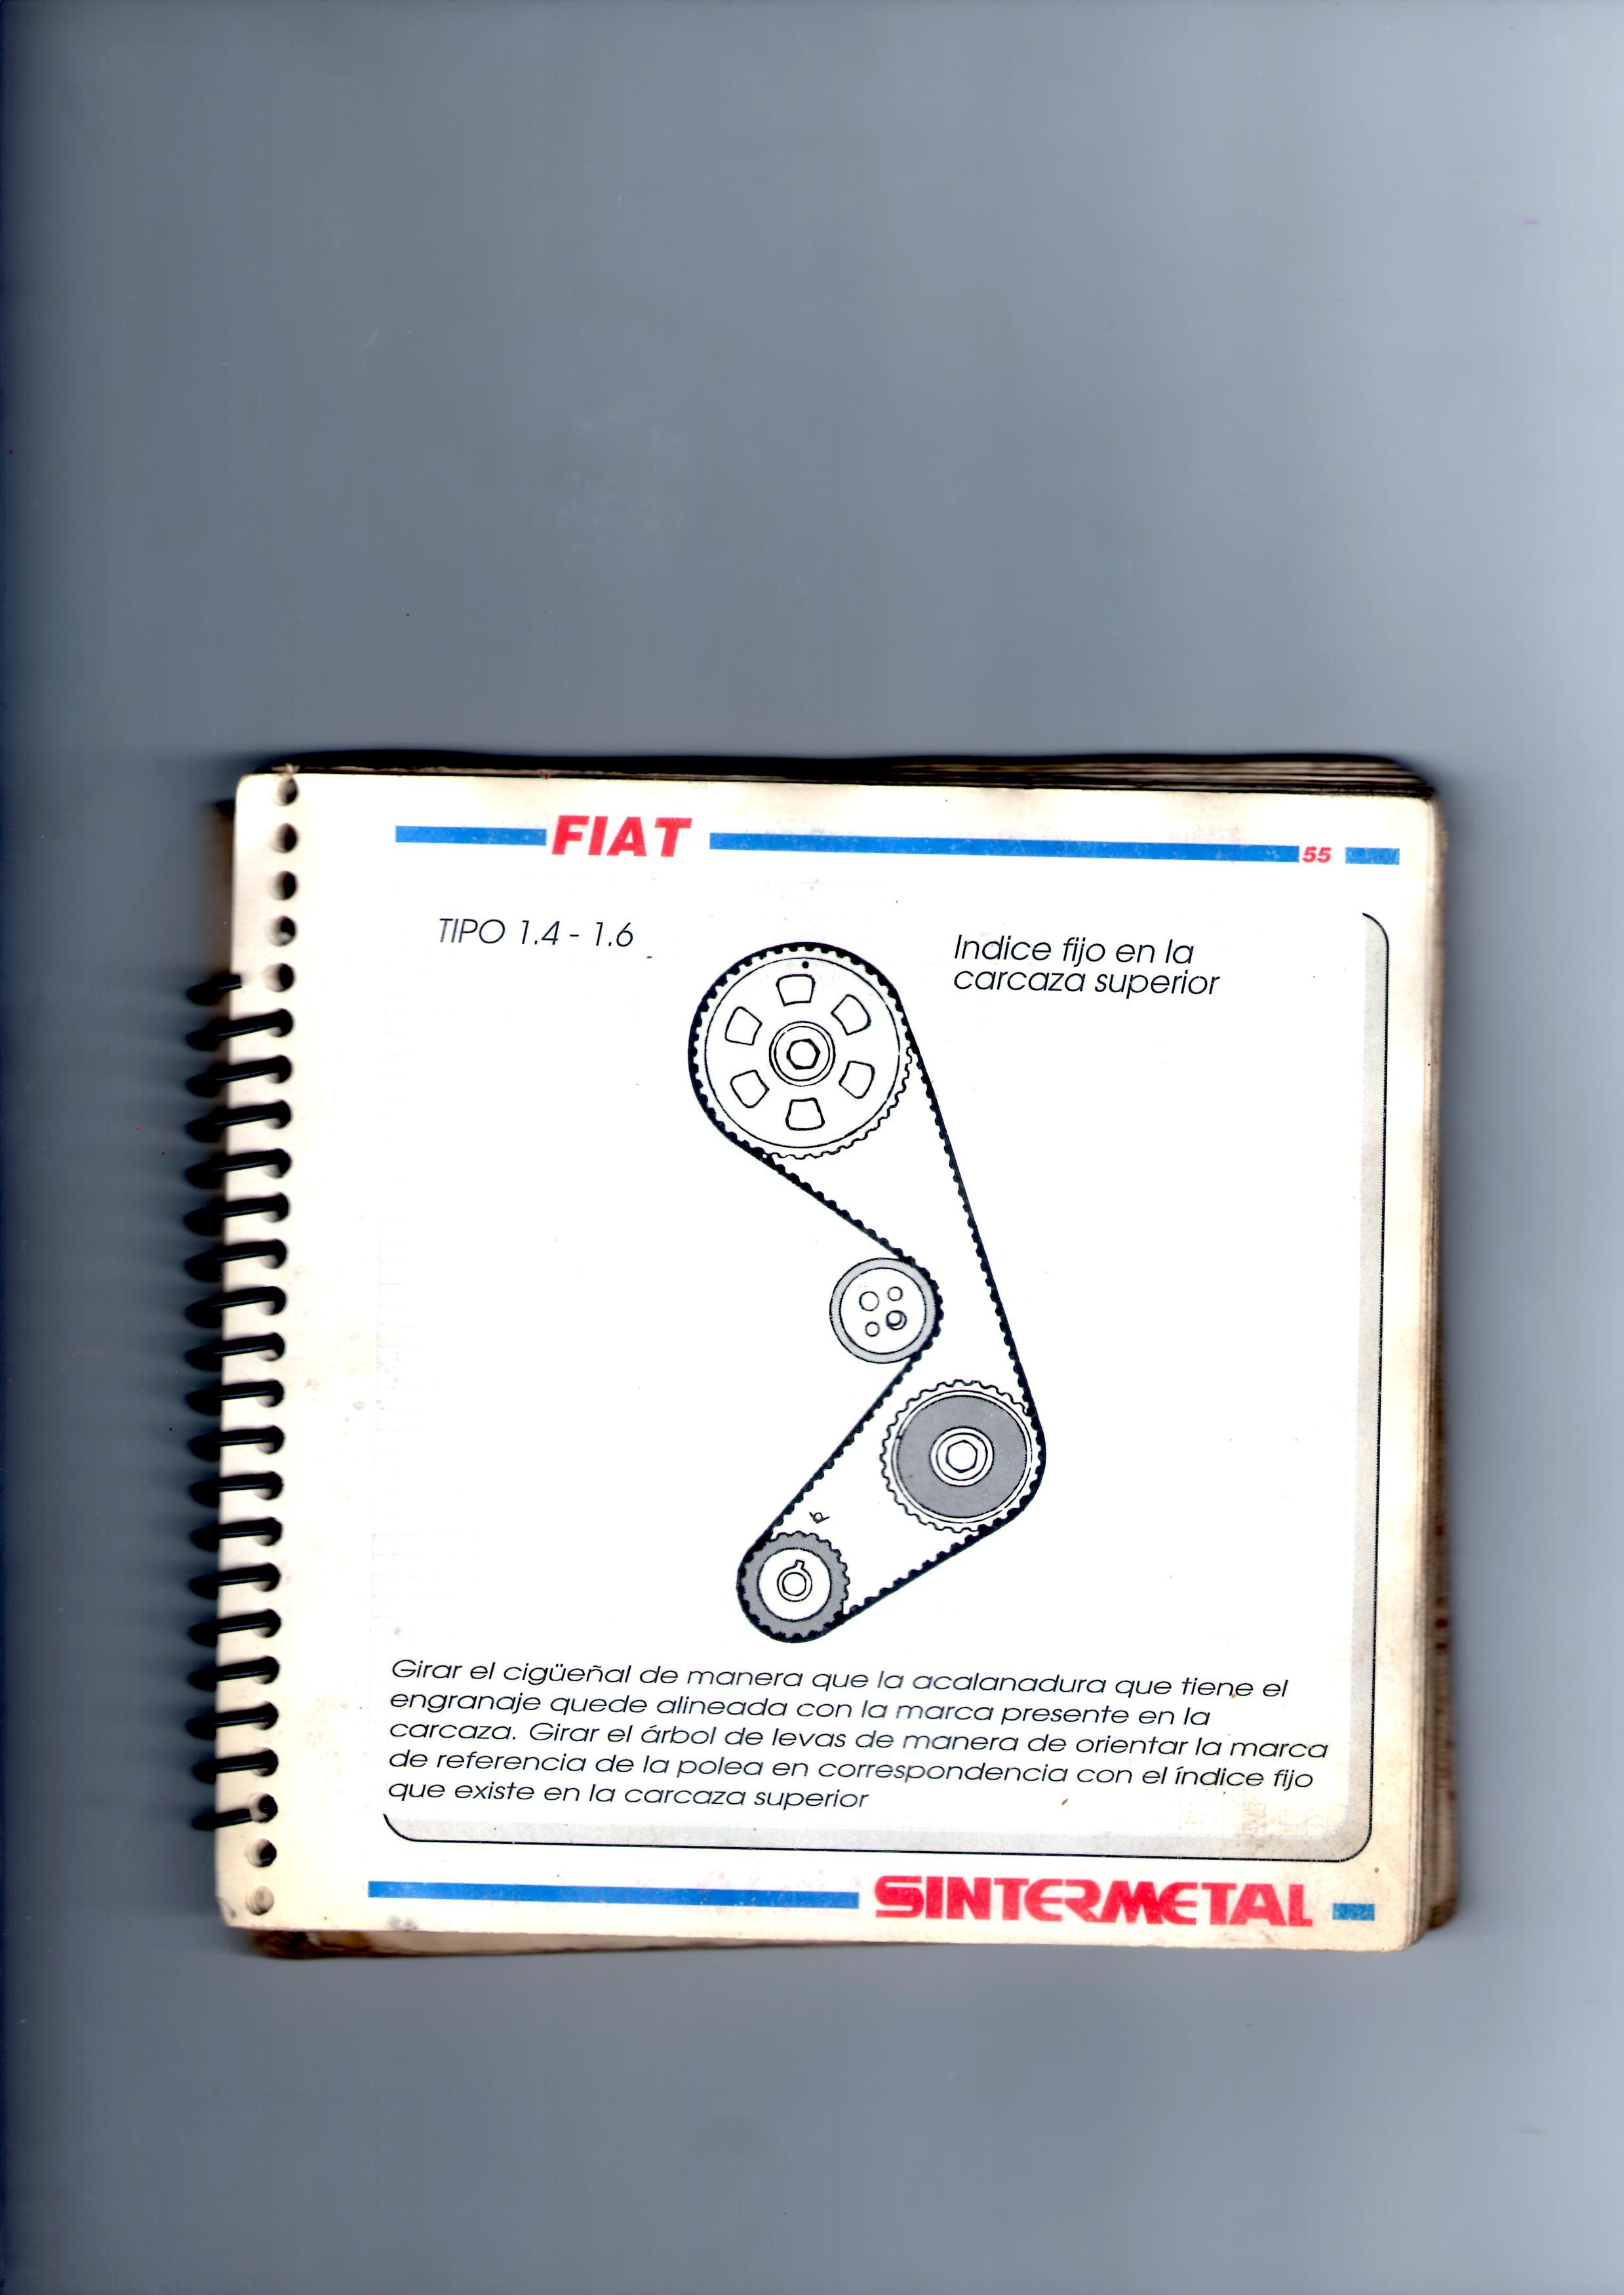 o Sincronizar Motor Tipo 16 Fiat Duna T1500887 further Fiat Cinquecento Uk Spec 170 1993 98 Pictures 49076 in addition File Punto Cabrio Bertone rear likewise Fiat Uno furthermore wechseln. on 1993 fiat punto